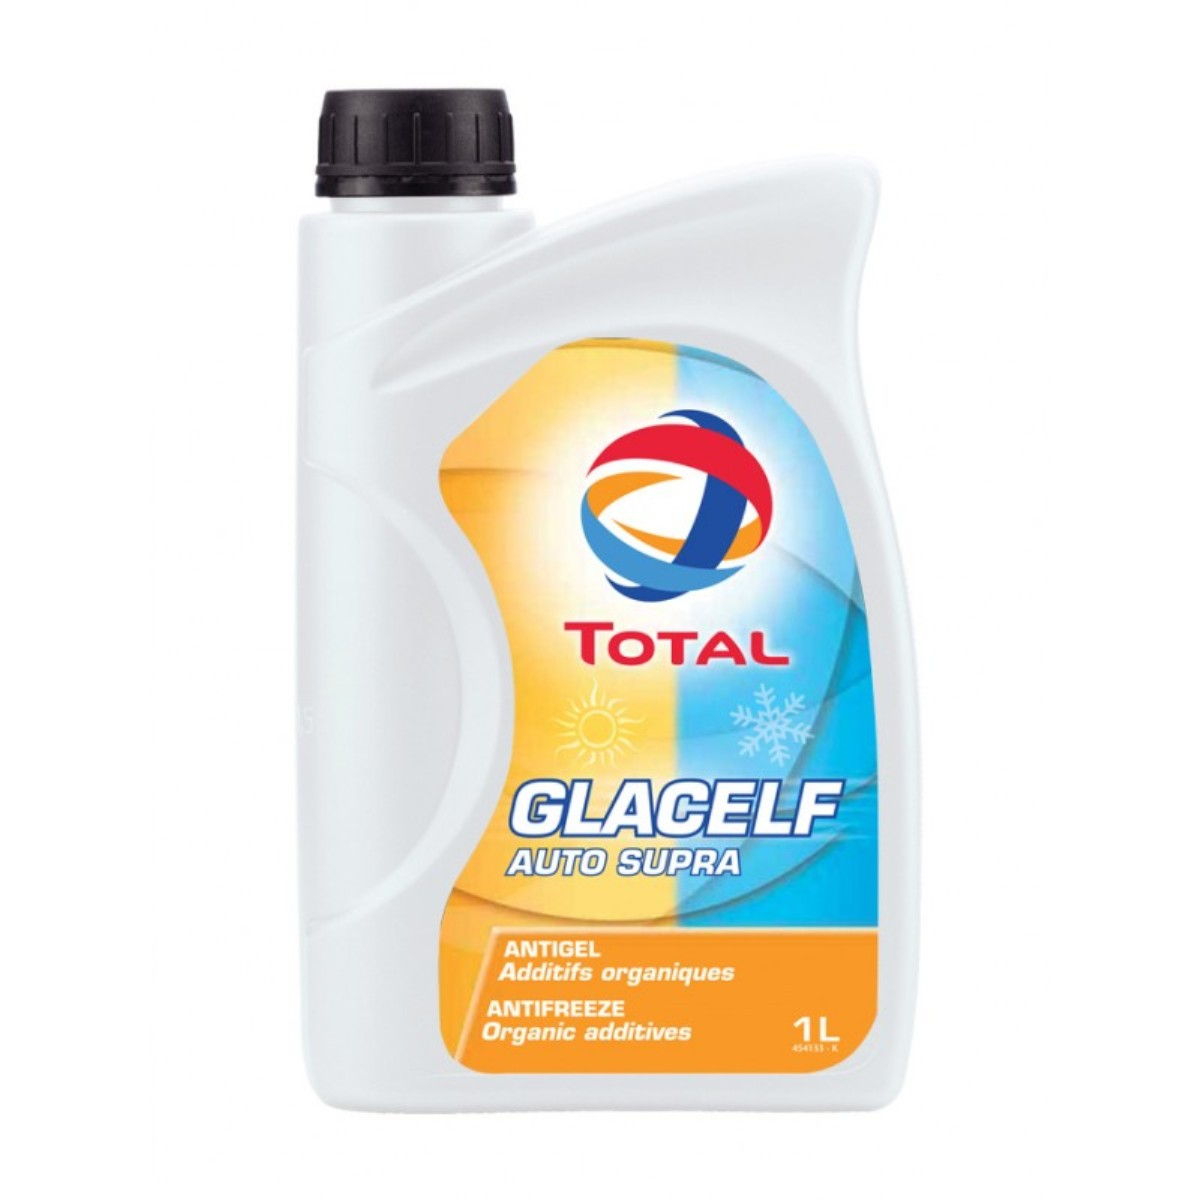 цена на Антифриз Total Glacelf Auto Supra -38, цвет: оранжевый, 1 л